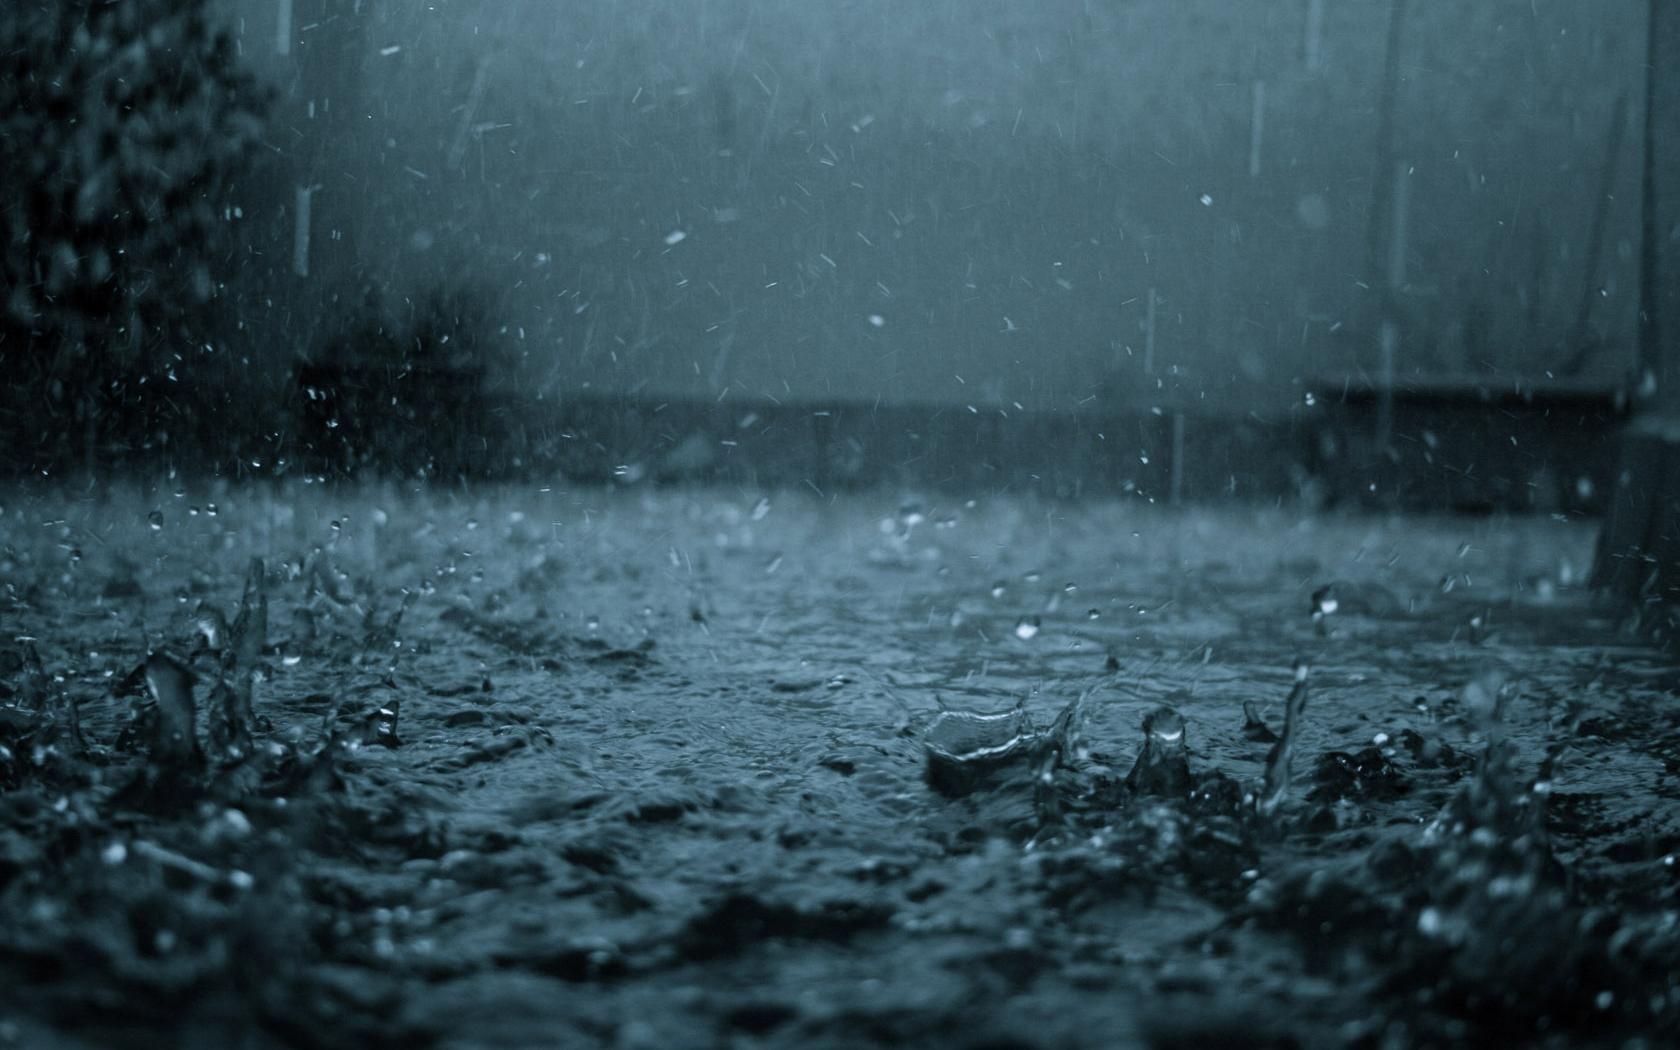 Rain Rainy Nature Beauty Splash Rain Wallpapers Rain Water Collection Dancing In The Rain